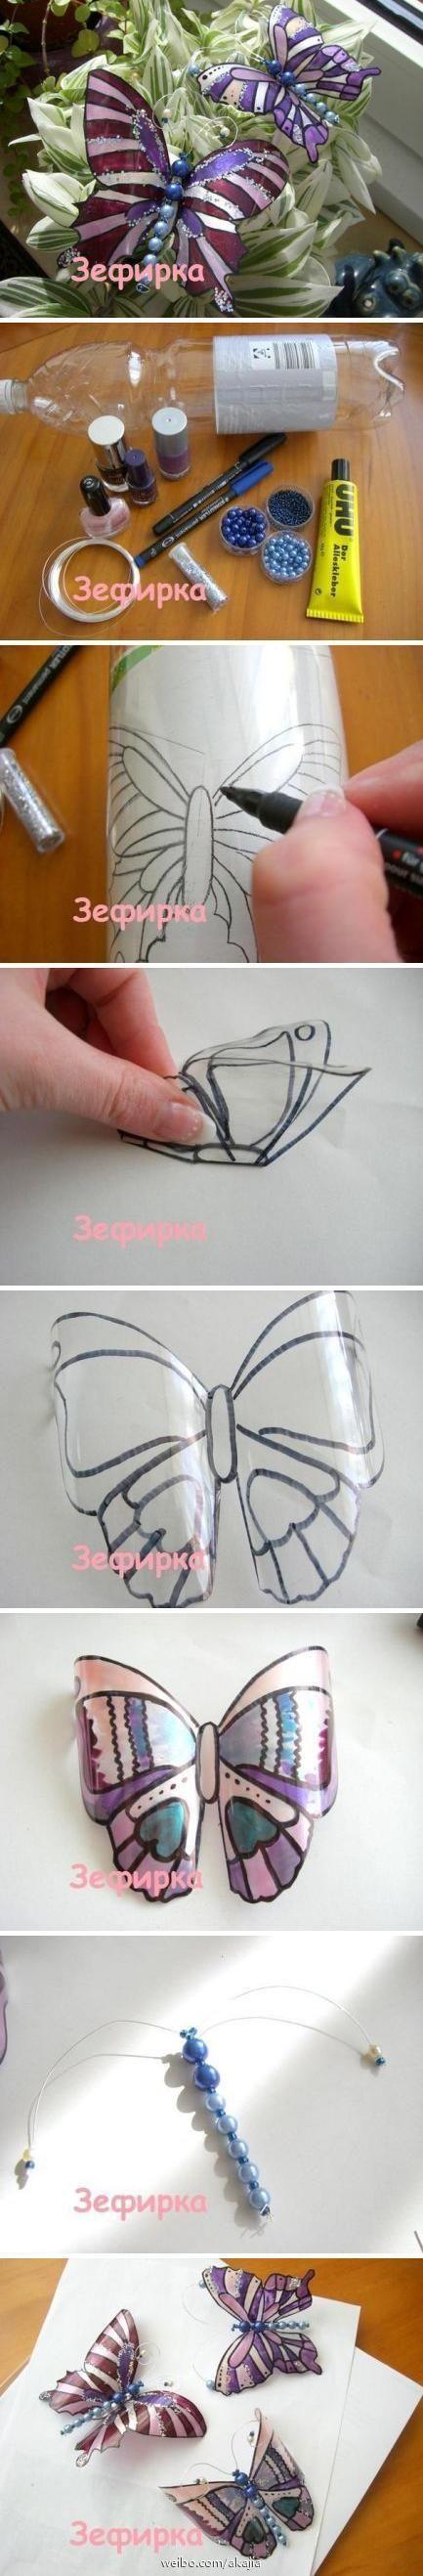 borboleta em garrafa de plástico